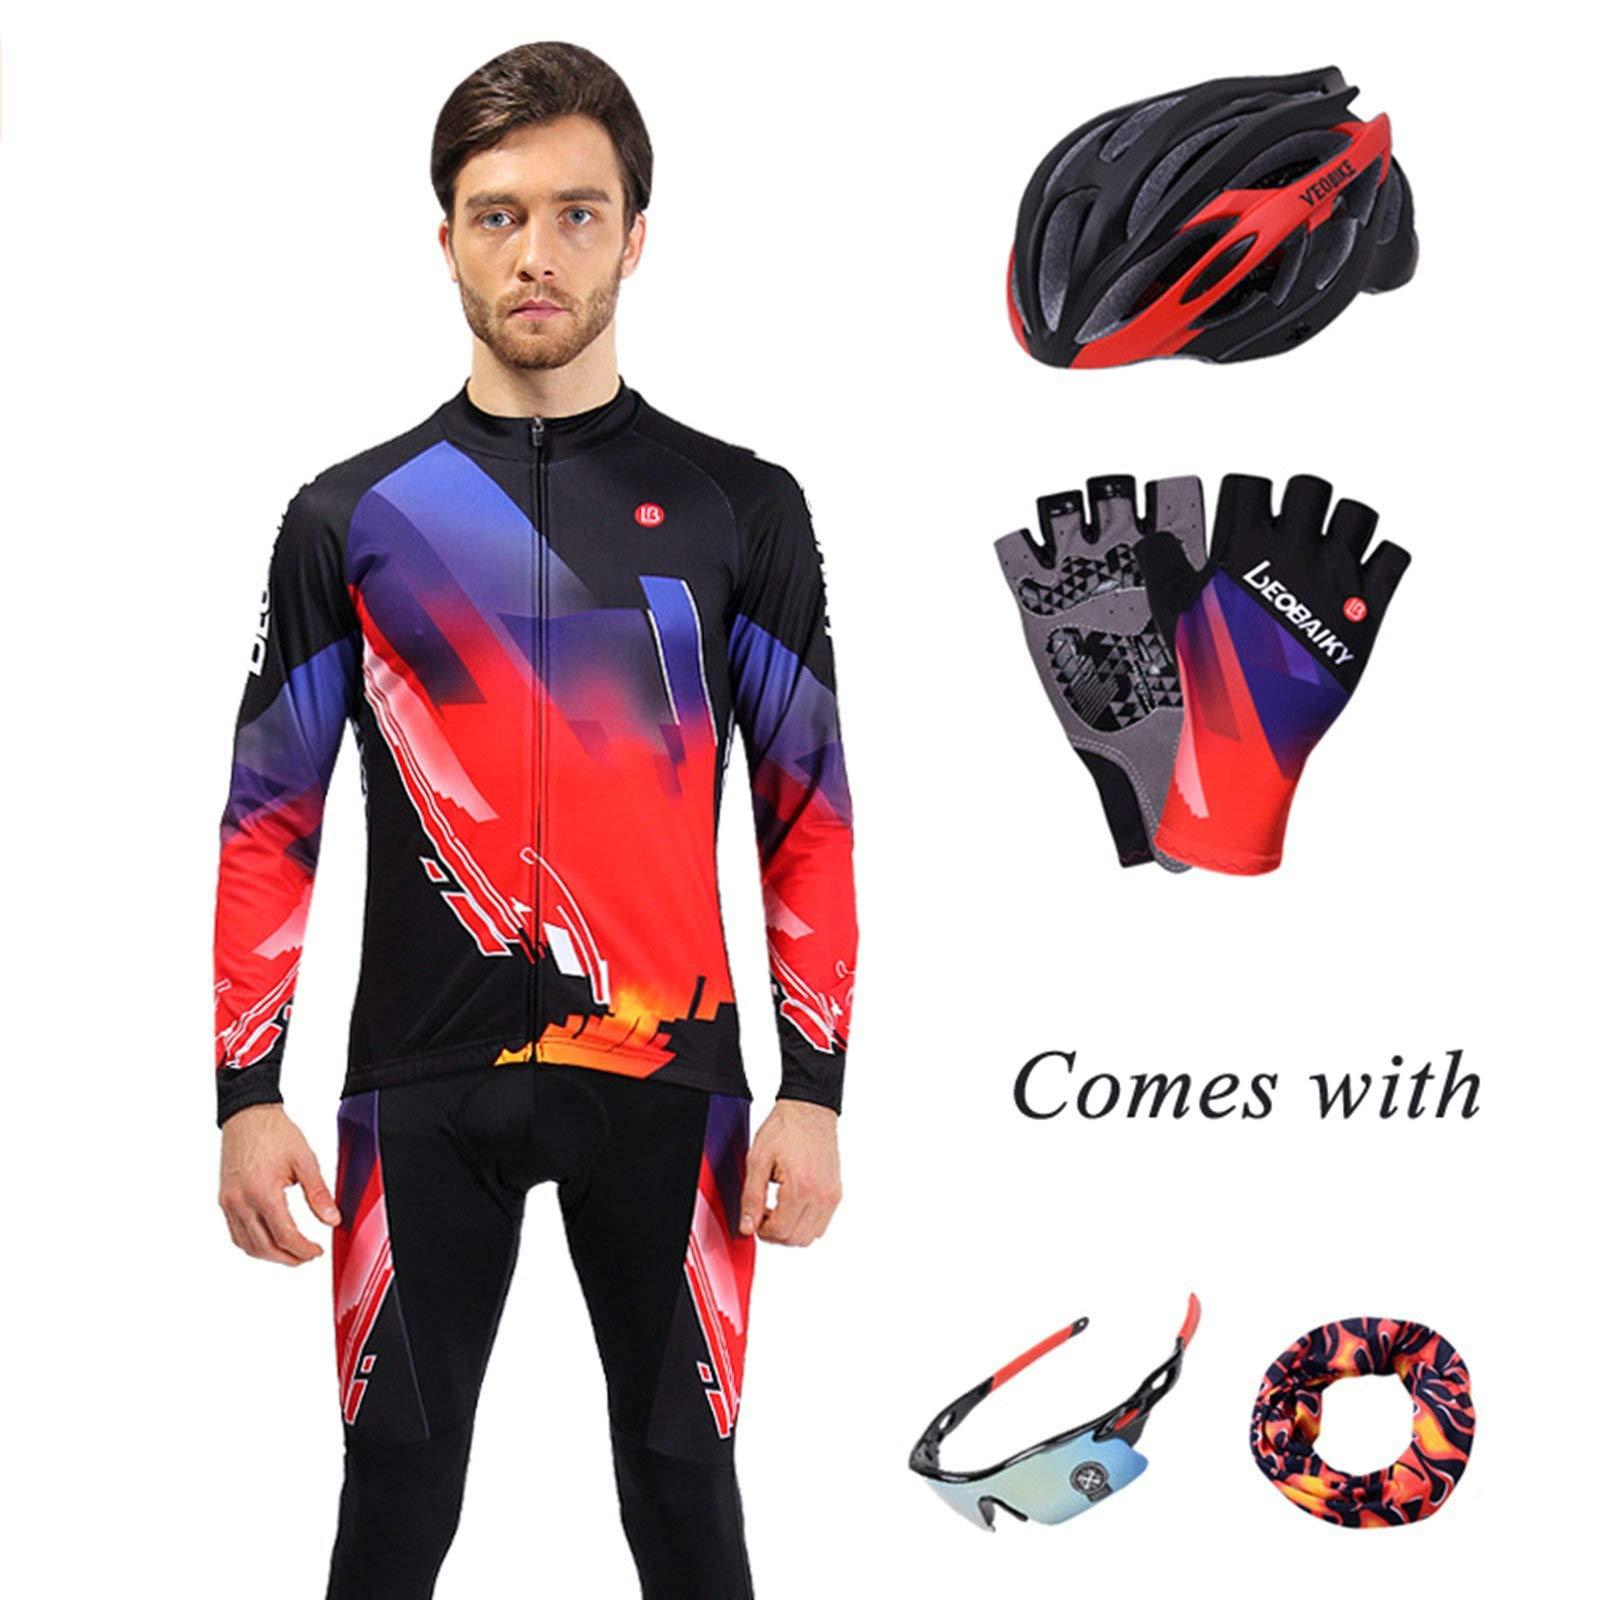 Aooaz Men's Biking Clothing Set Shirt Leggings with Helmet/Gloves/Goggles/Mask Black S